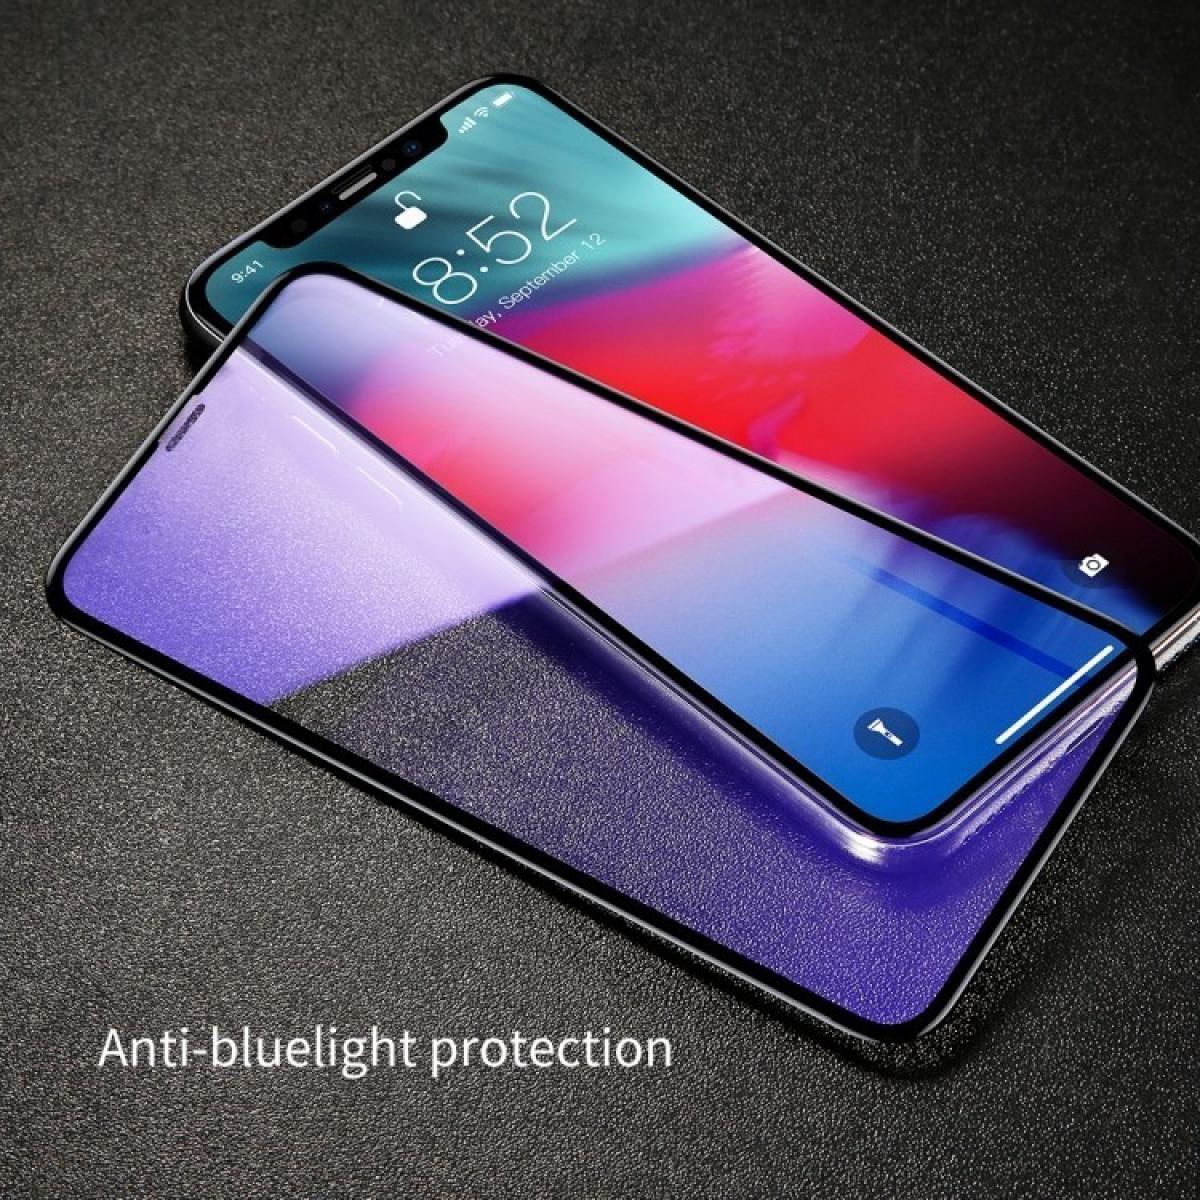 Многослойное стекло на АЙфон 11